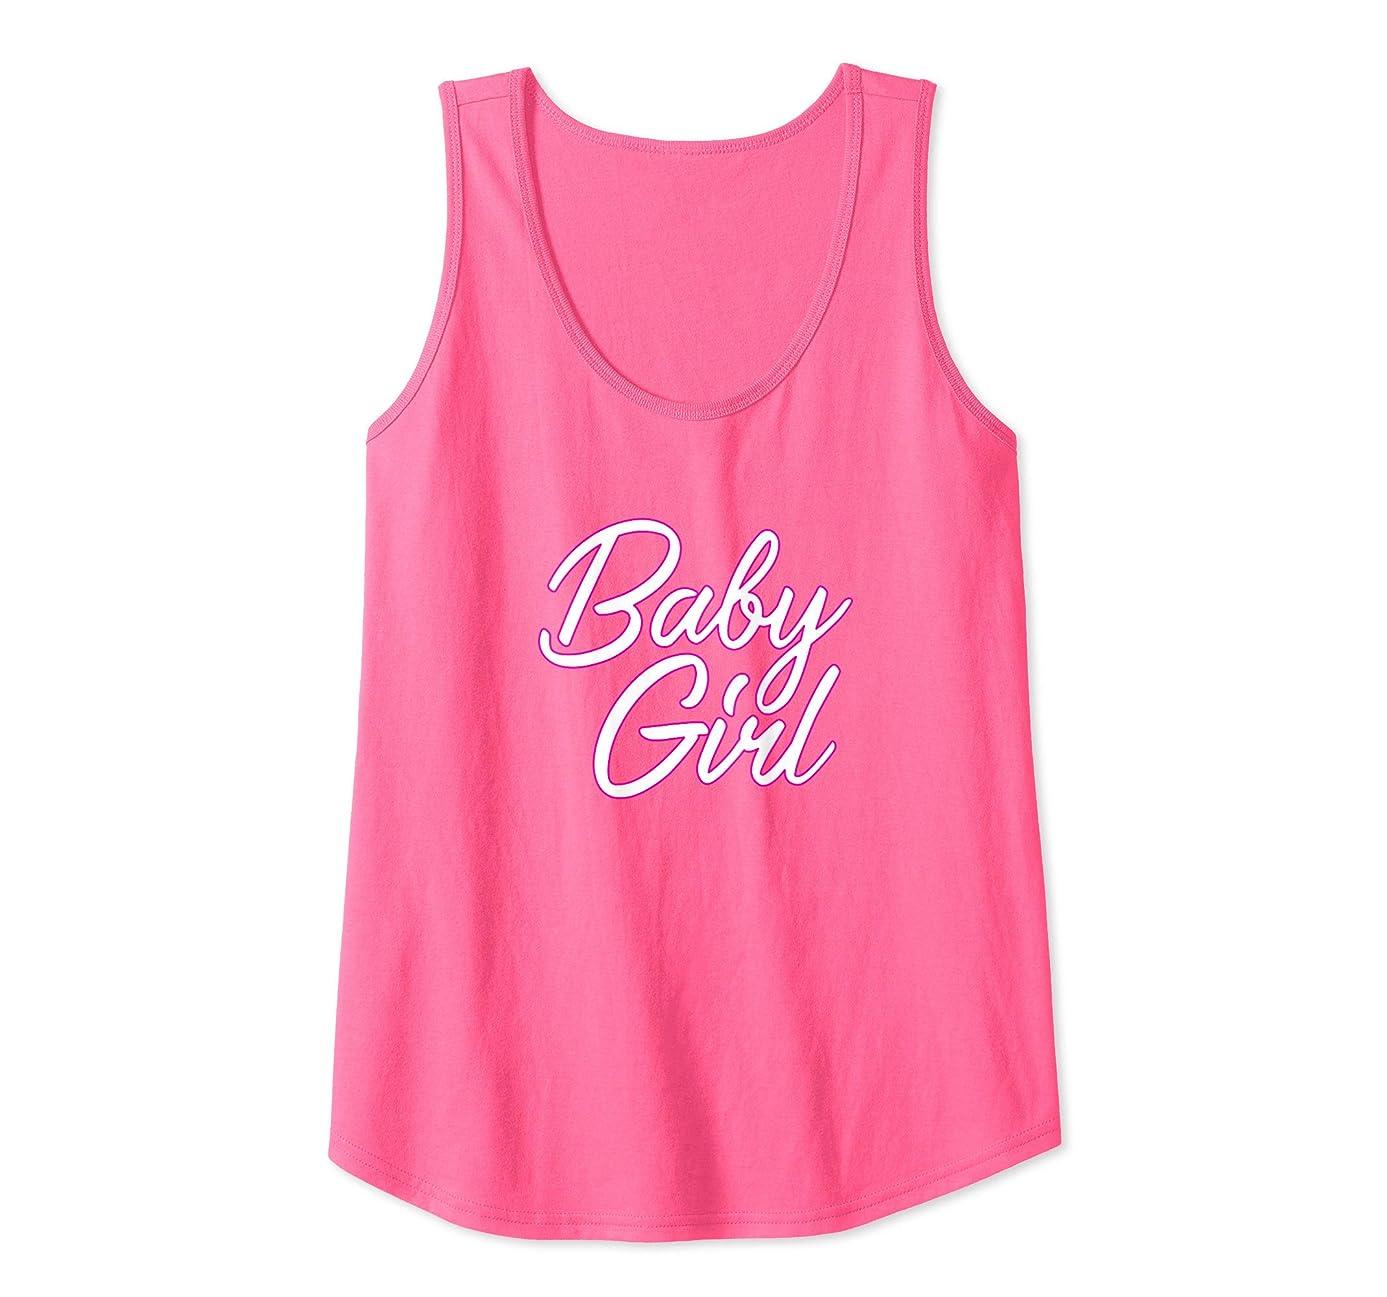 Womens Kinky DDLG BDSM Clothing Gift: Baby Girl Shirt / Babygirl Tank Top